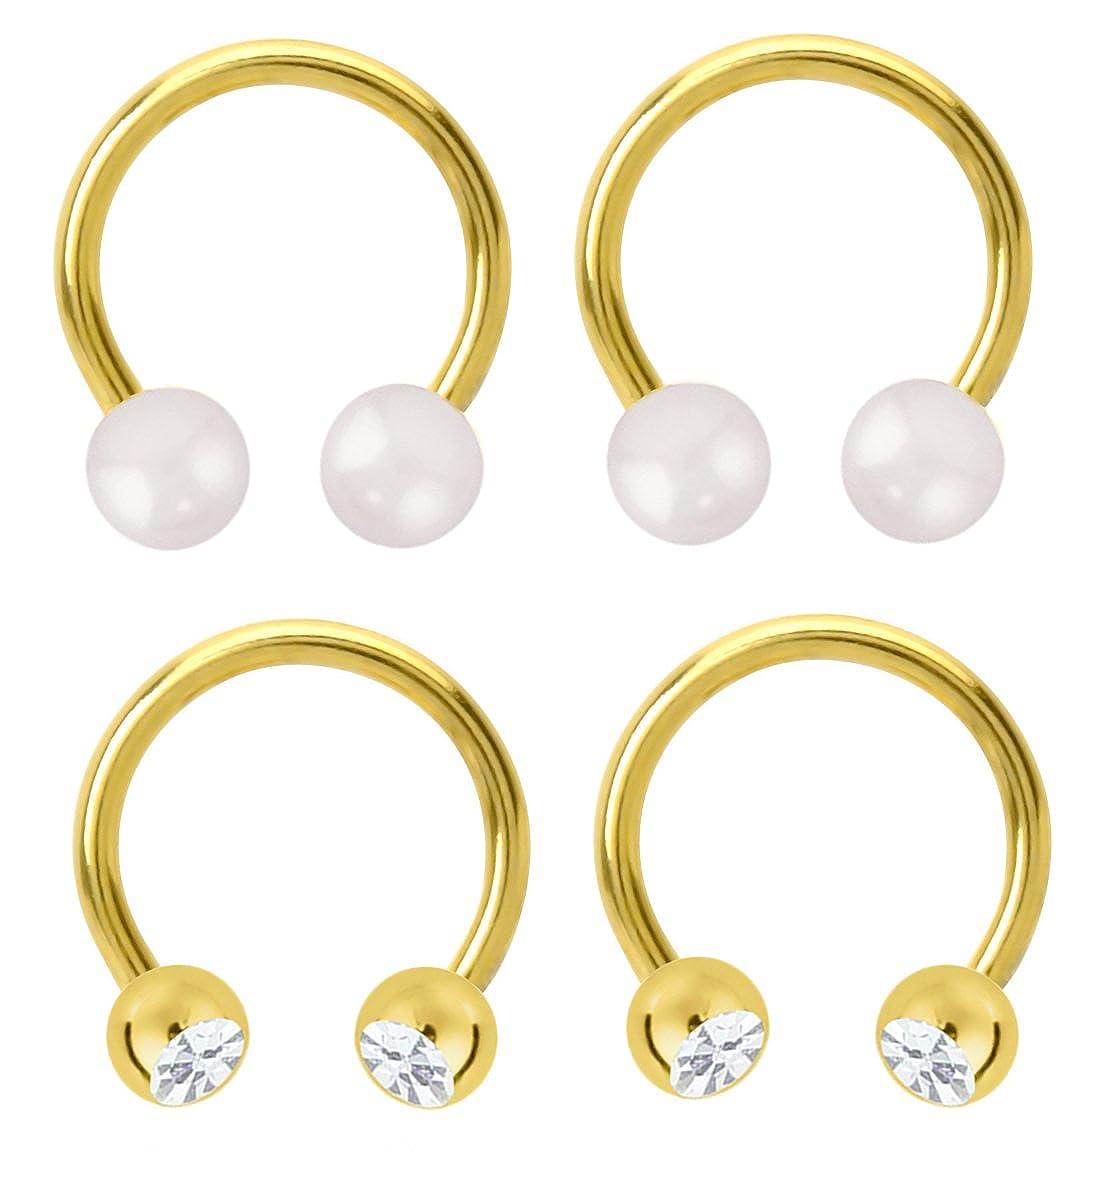 1//2 earring hoop belly septum 14g nipple 2 Pair Pearl /& cz gem Gold Plated Horseshoe Ring lip